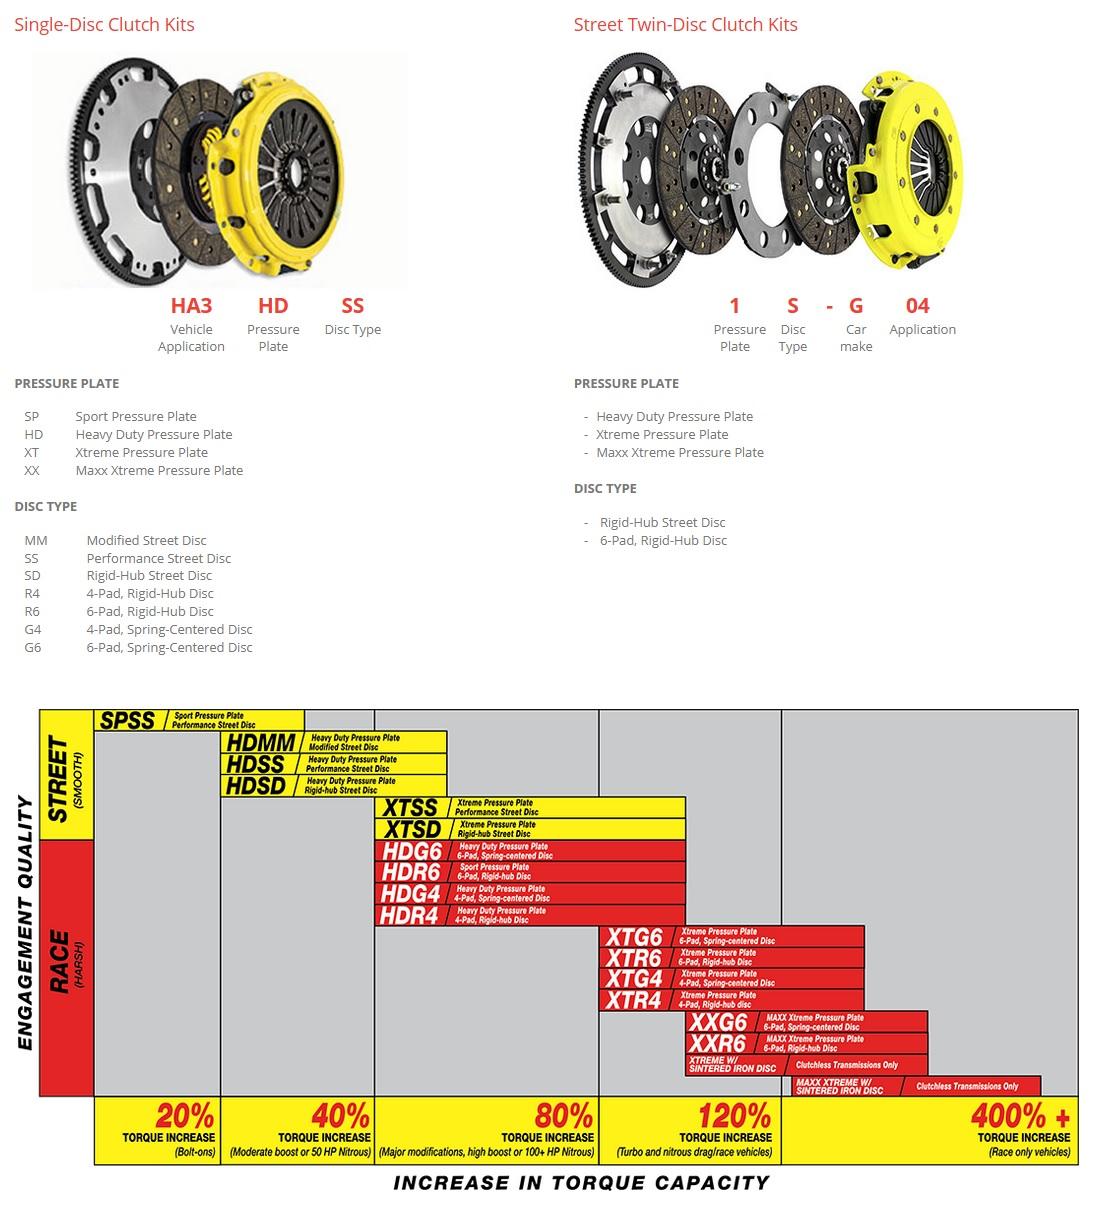 ACT H021 Heavy Duty Pressure P